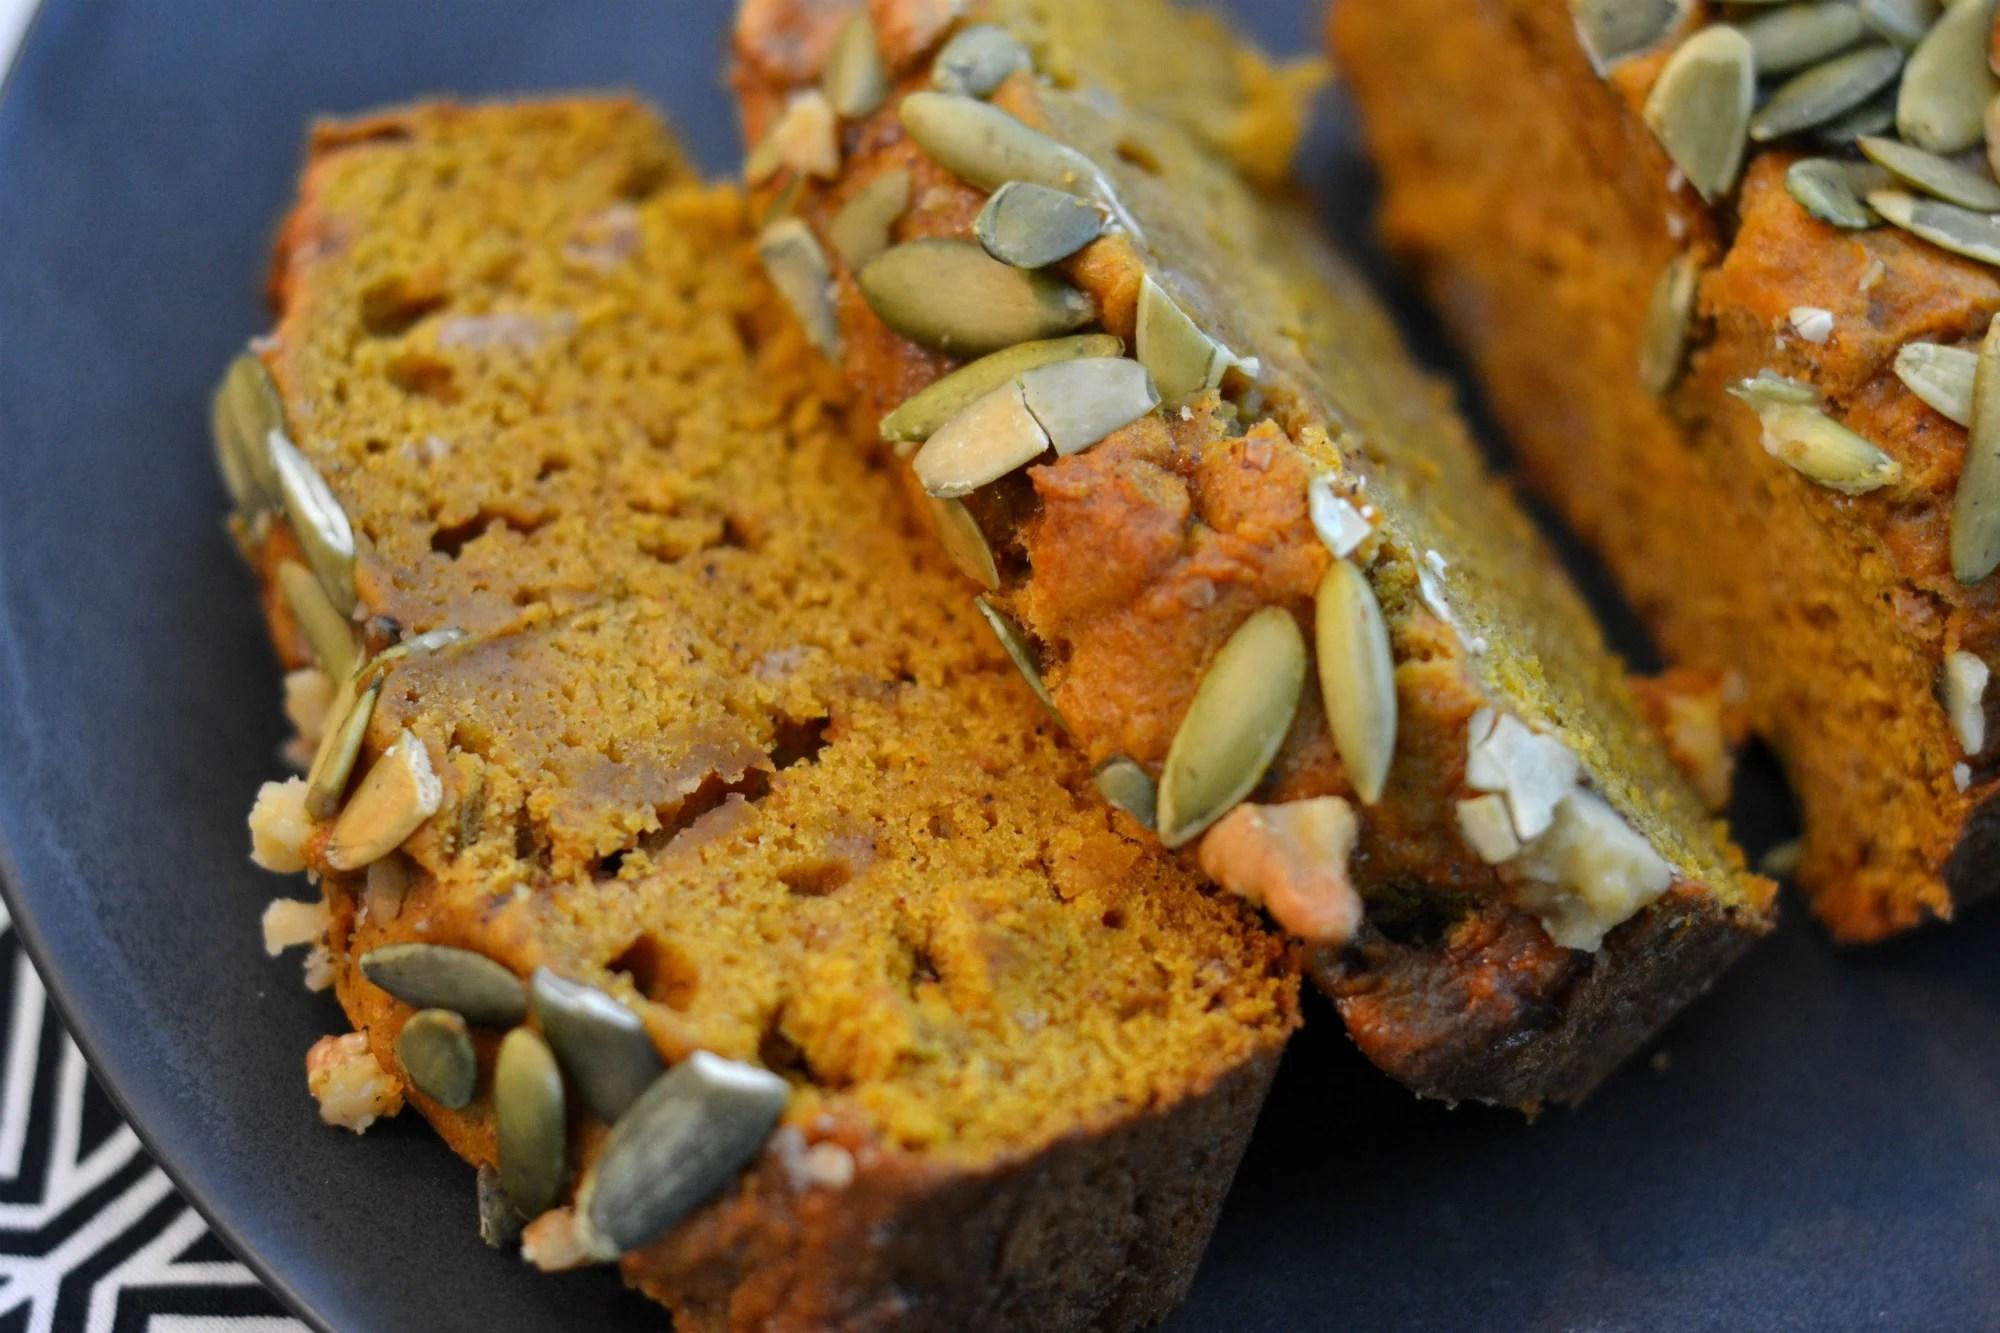 Pumpkin Bread Recipe that rivals Starbucks. Topped with pepitas and walnuts. Yum!   www.thesurferskitchen.com